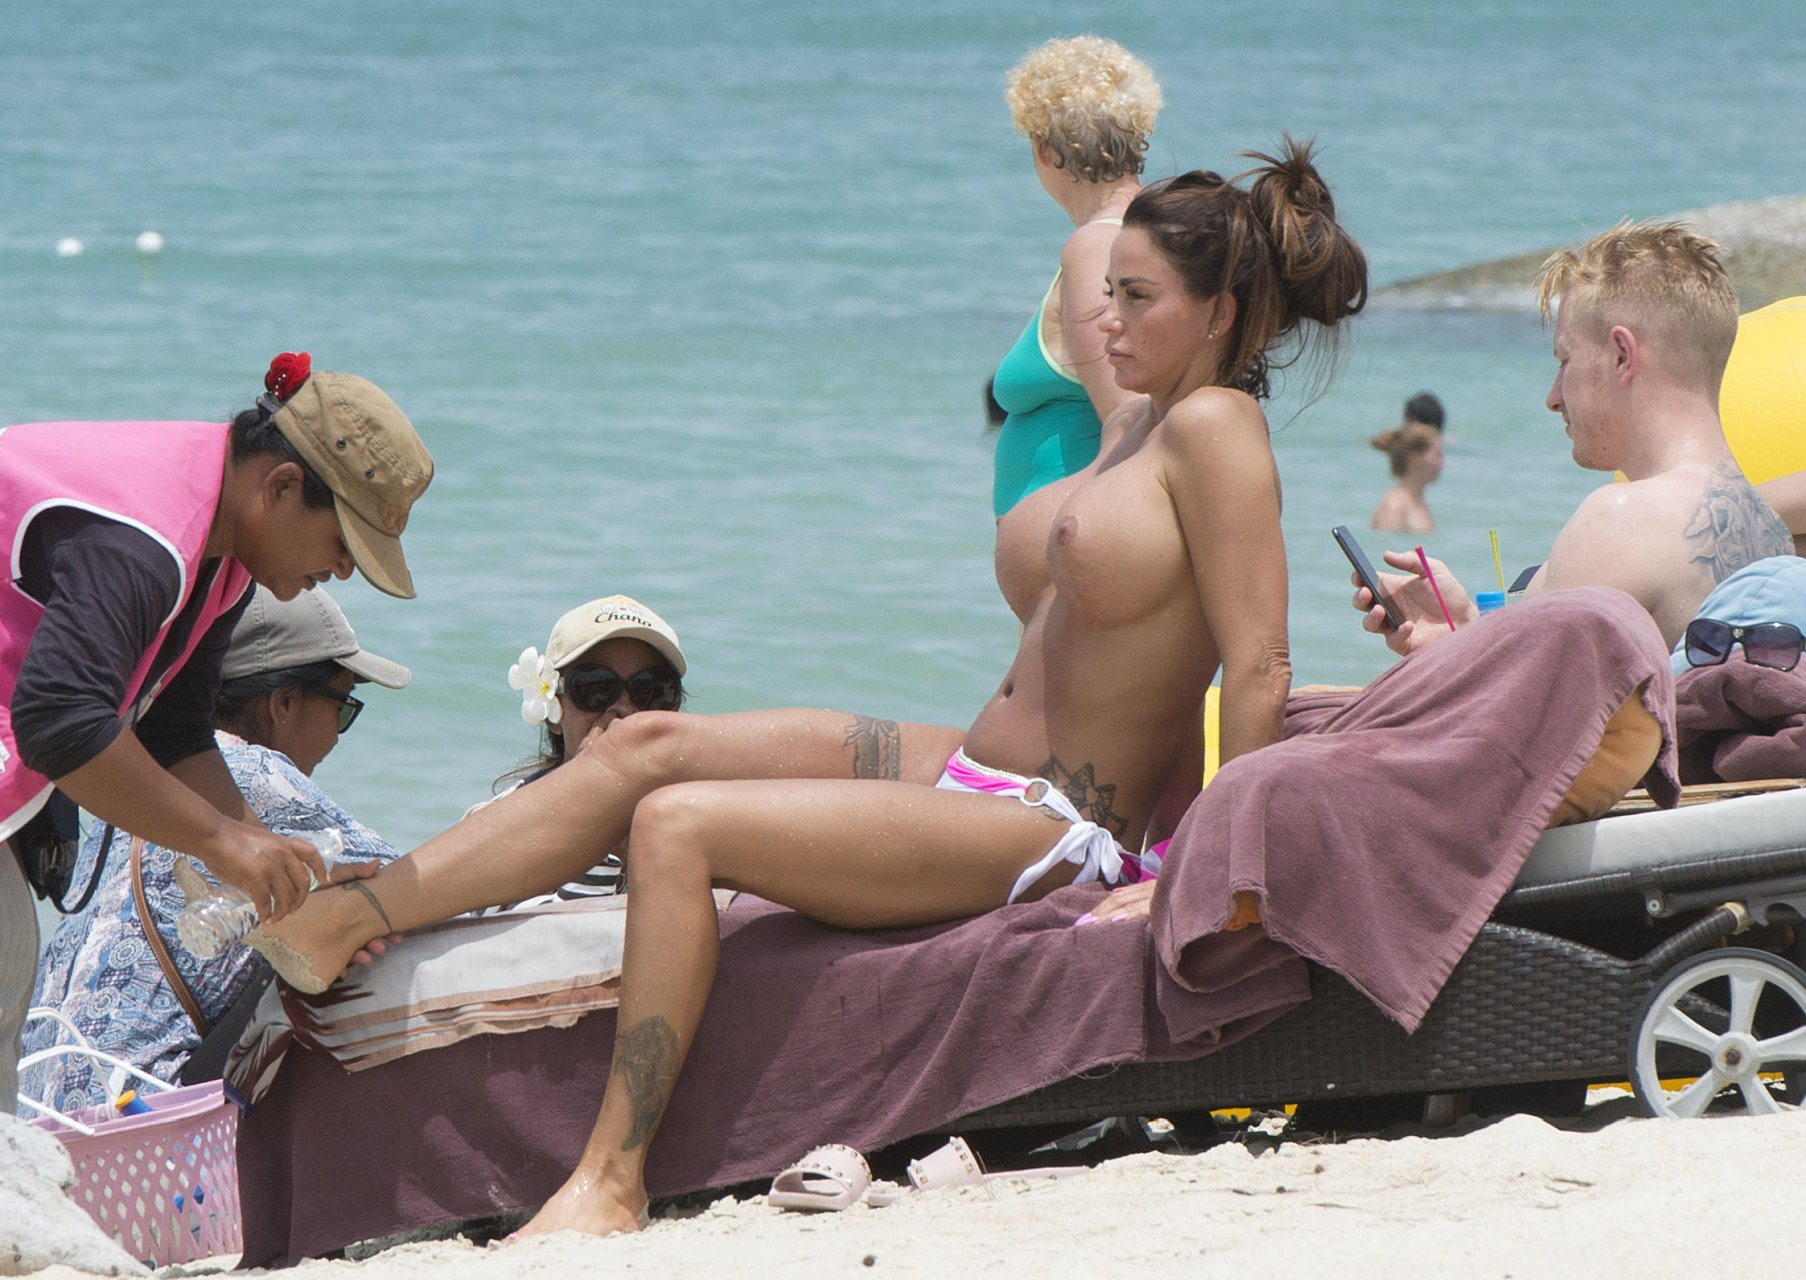 Katie-Price-Topless-TheFappeningBlog.com-24.jpg